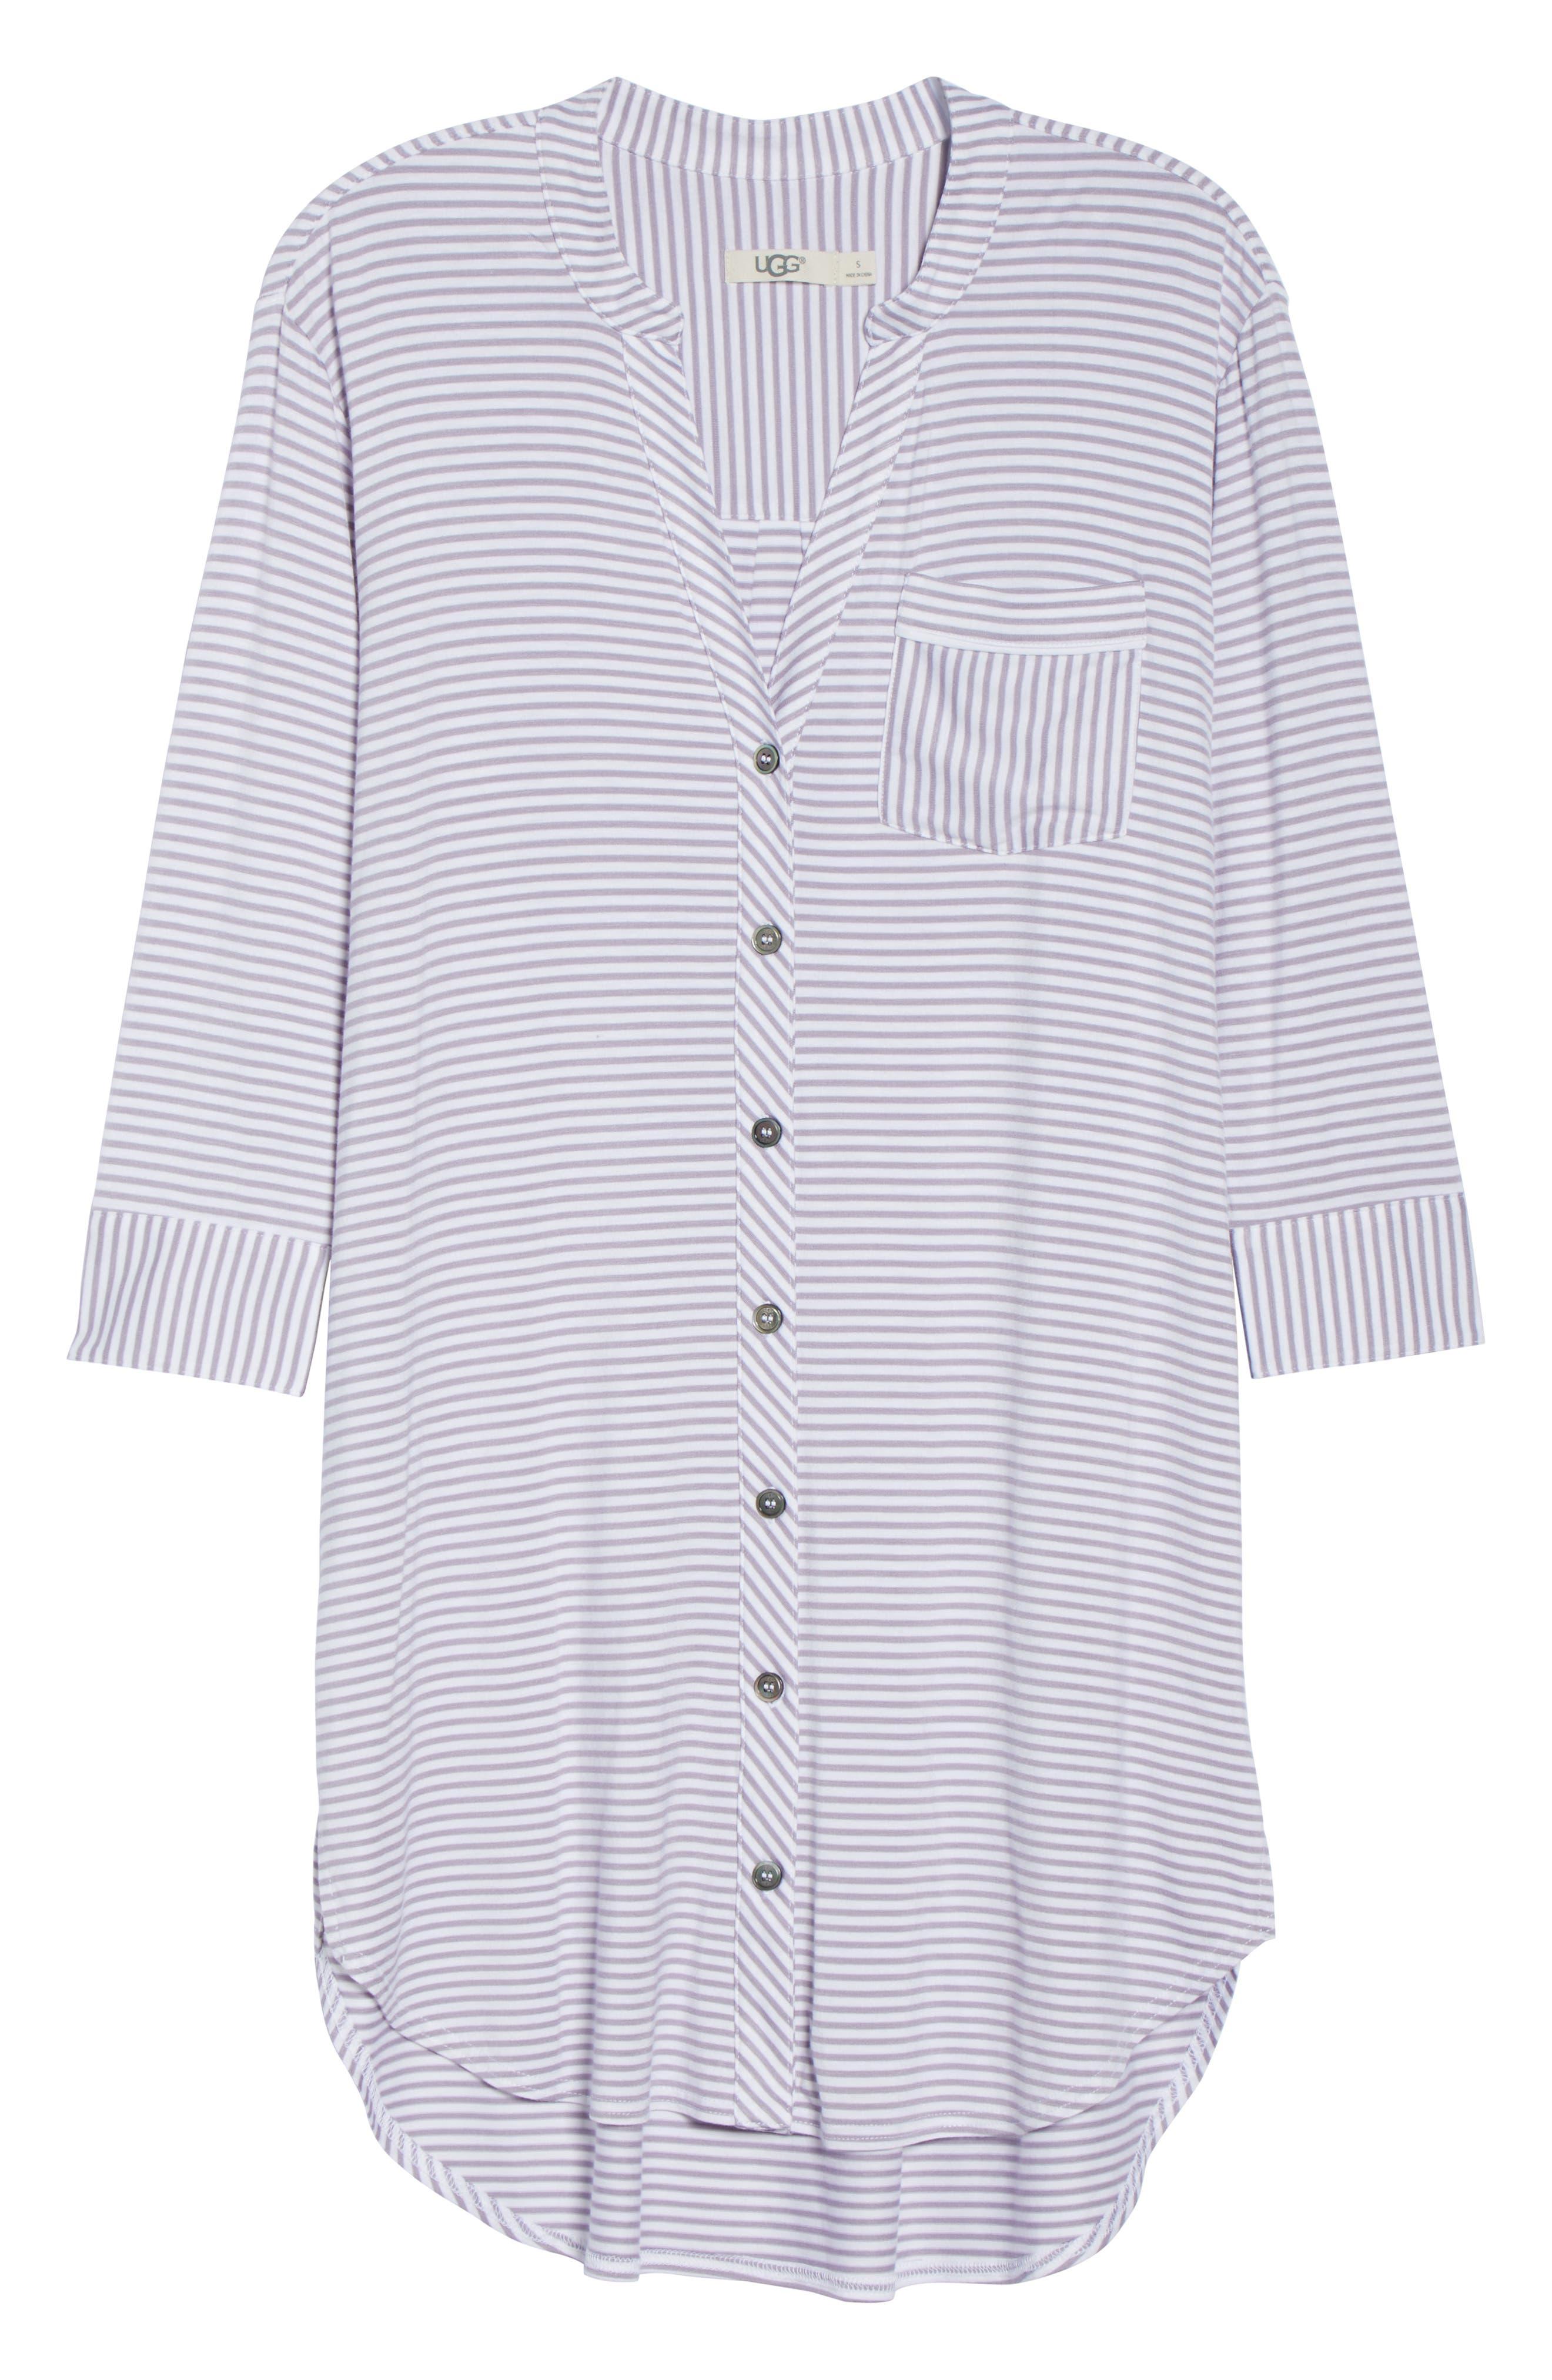 Vivian Sleep Shirt,                             Alternate thumbnail 6, color,                             LAVENDER AURA / WHITE STRIPE